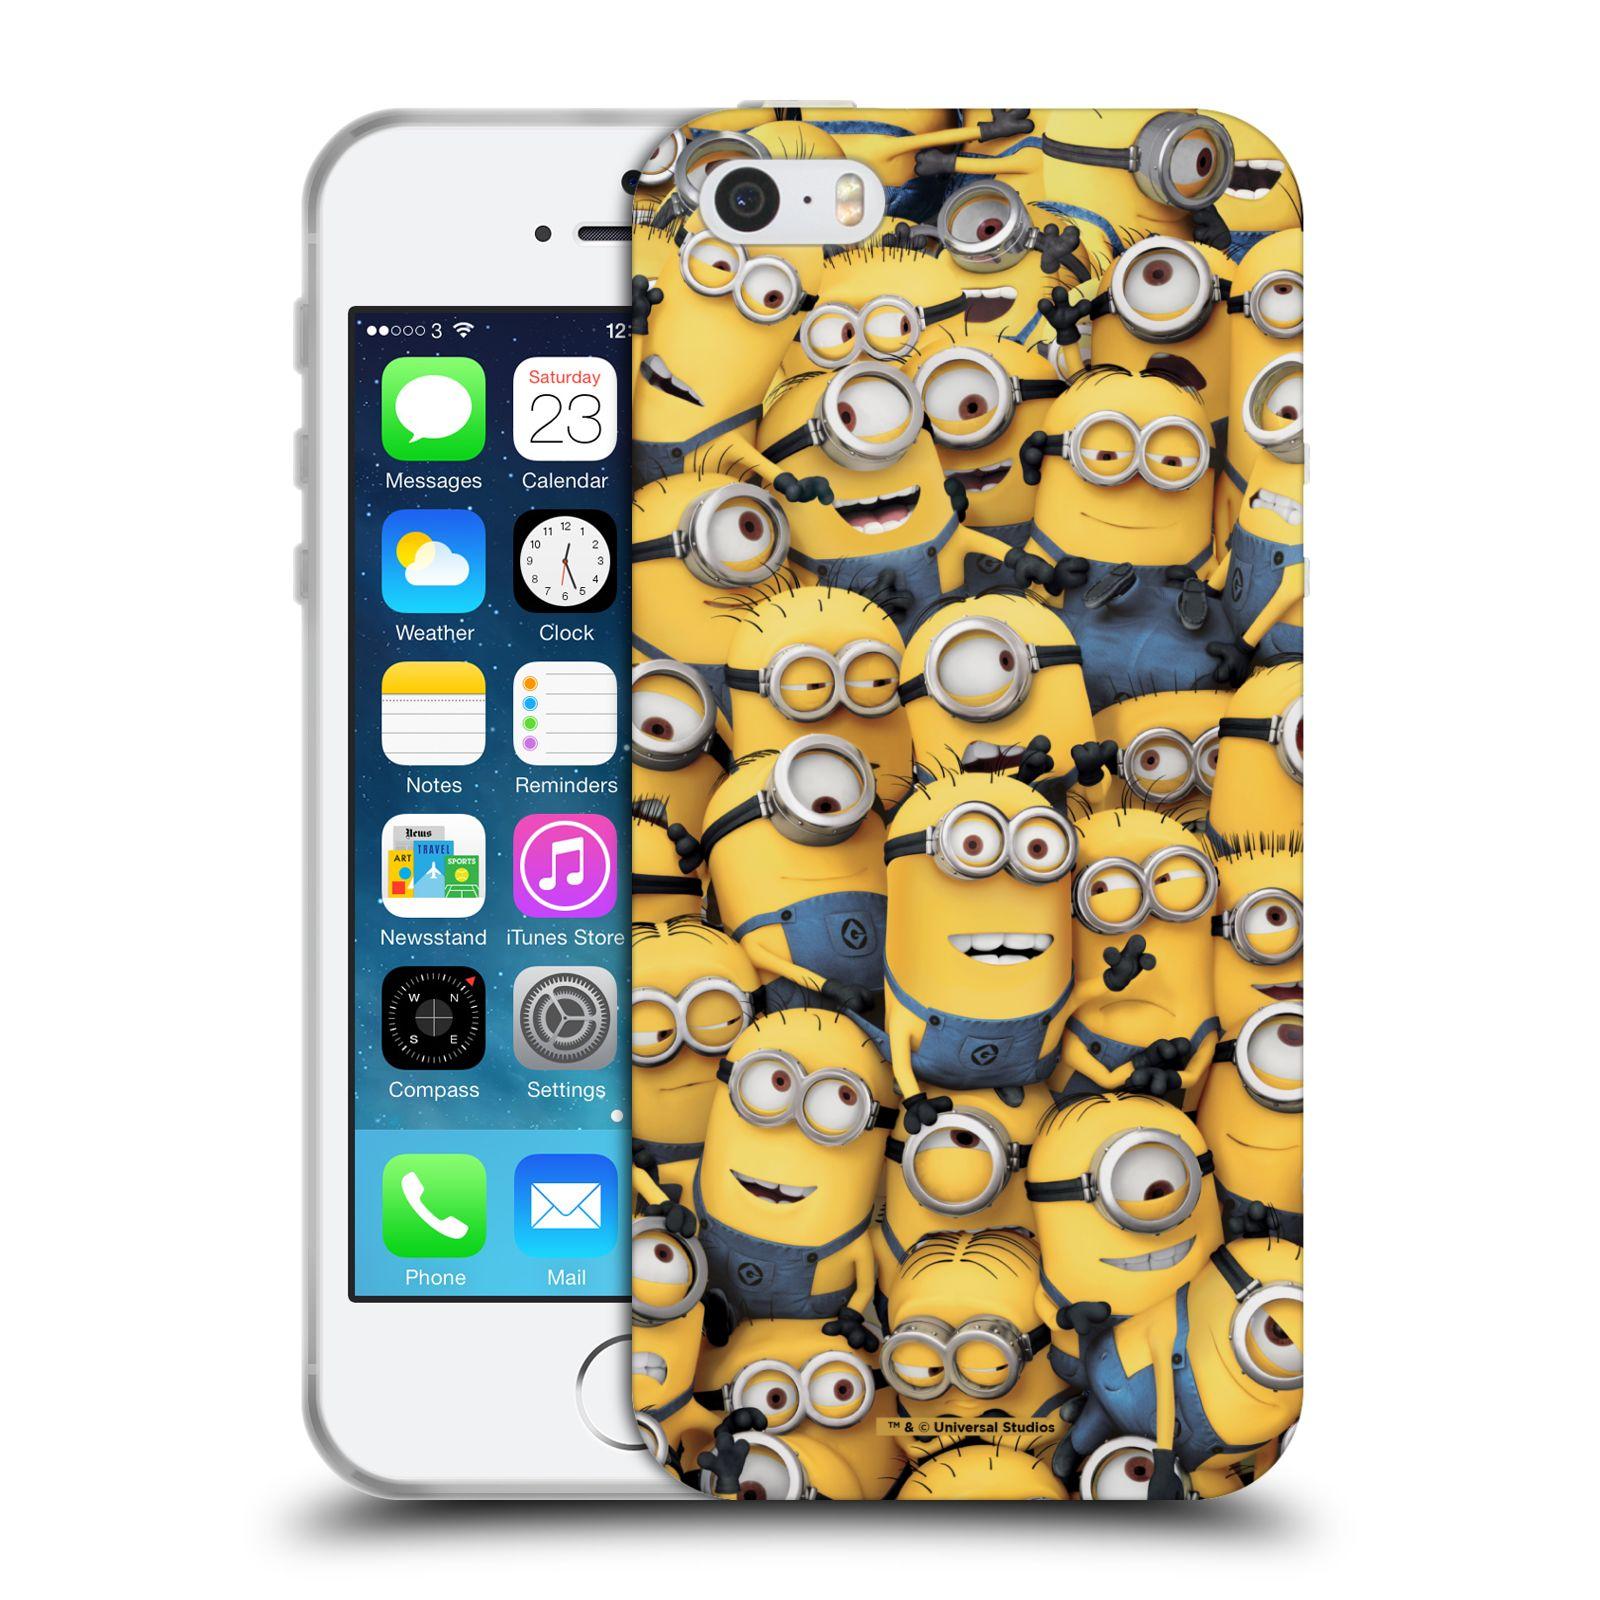 Silikonové pouzdro na mobil Apple iPhone 5, 5S, SE - Head Case - Mimoni všude z filmu Já, padouch - Despicable Me